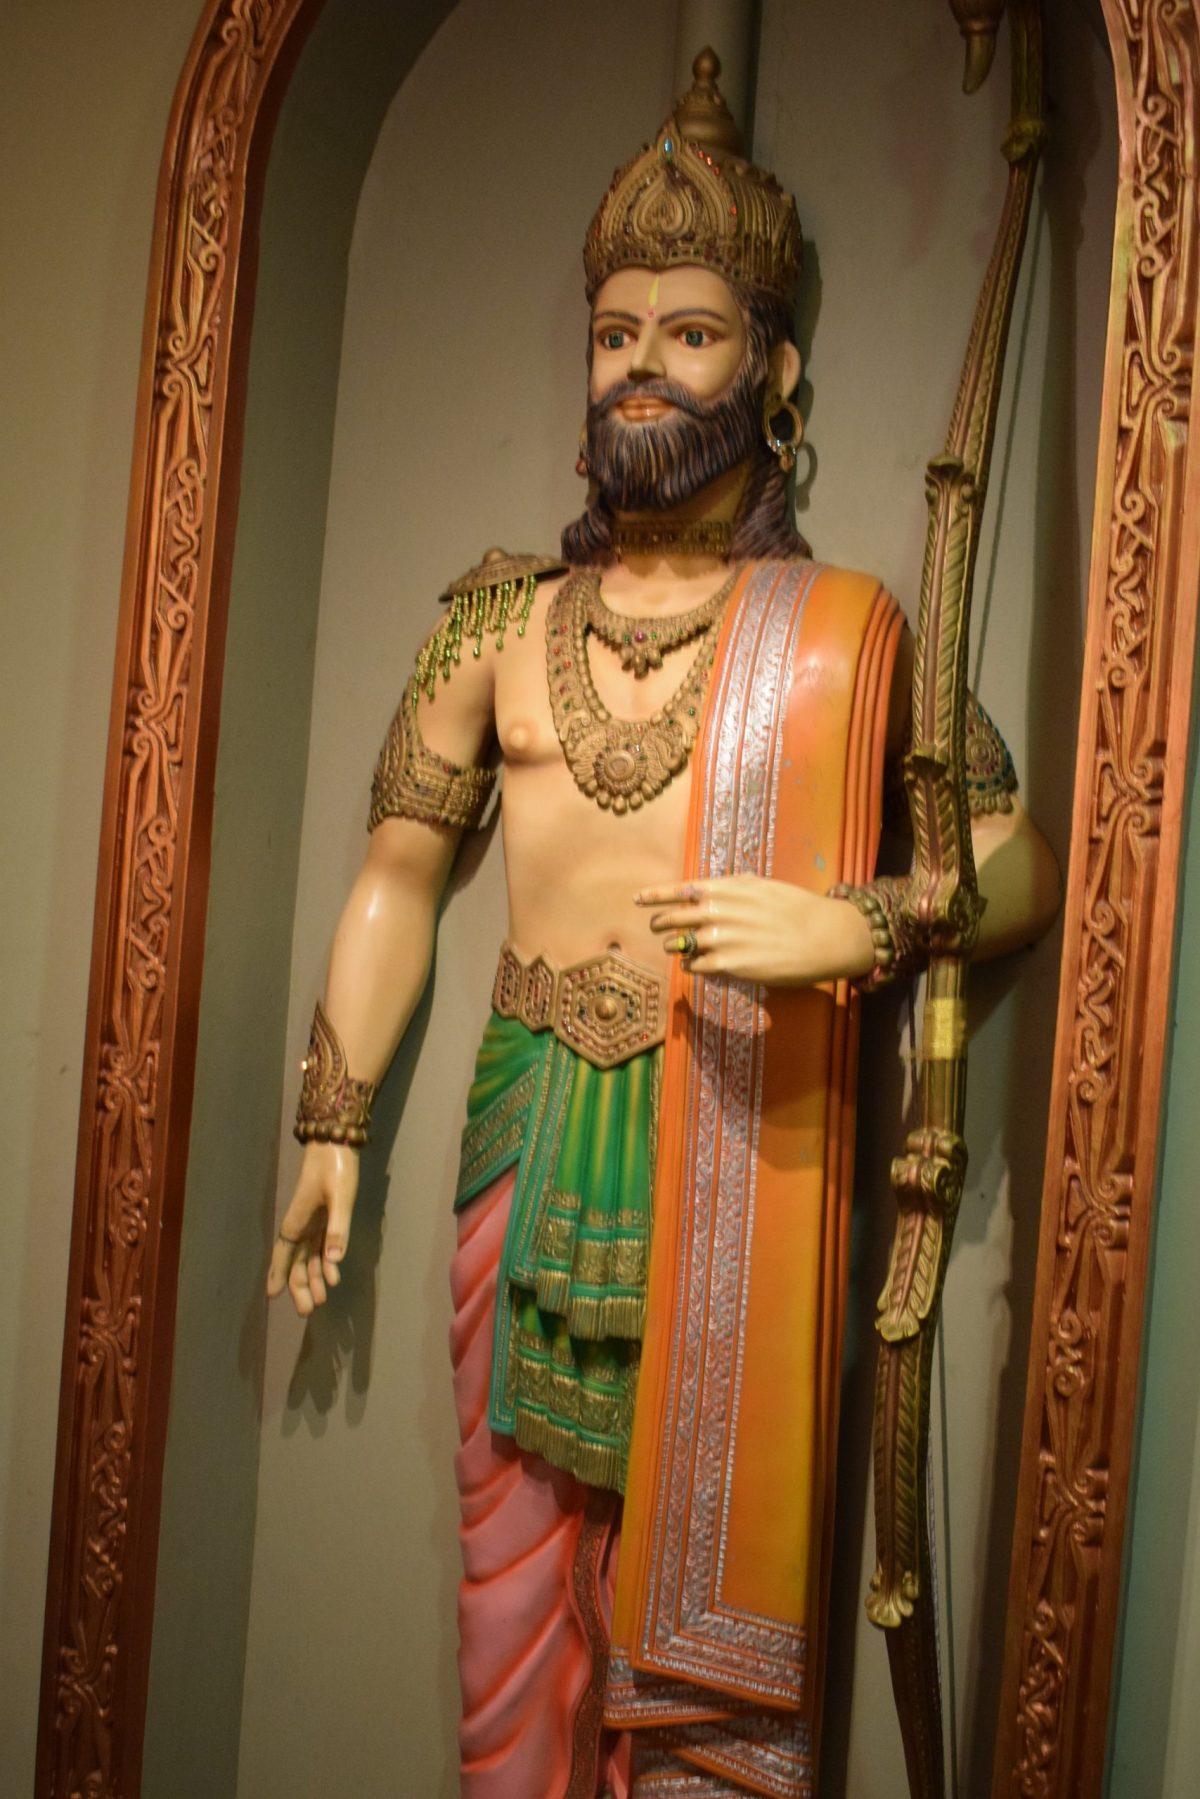 Hyderabad Film city Mahabharat set